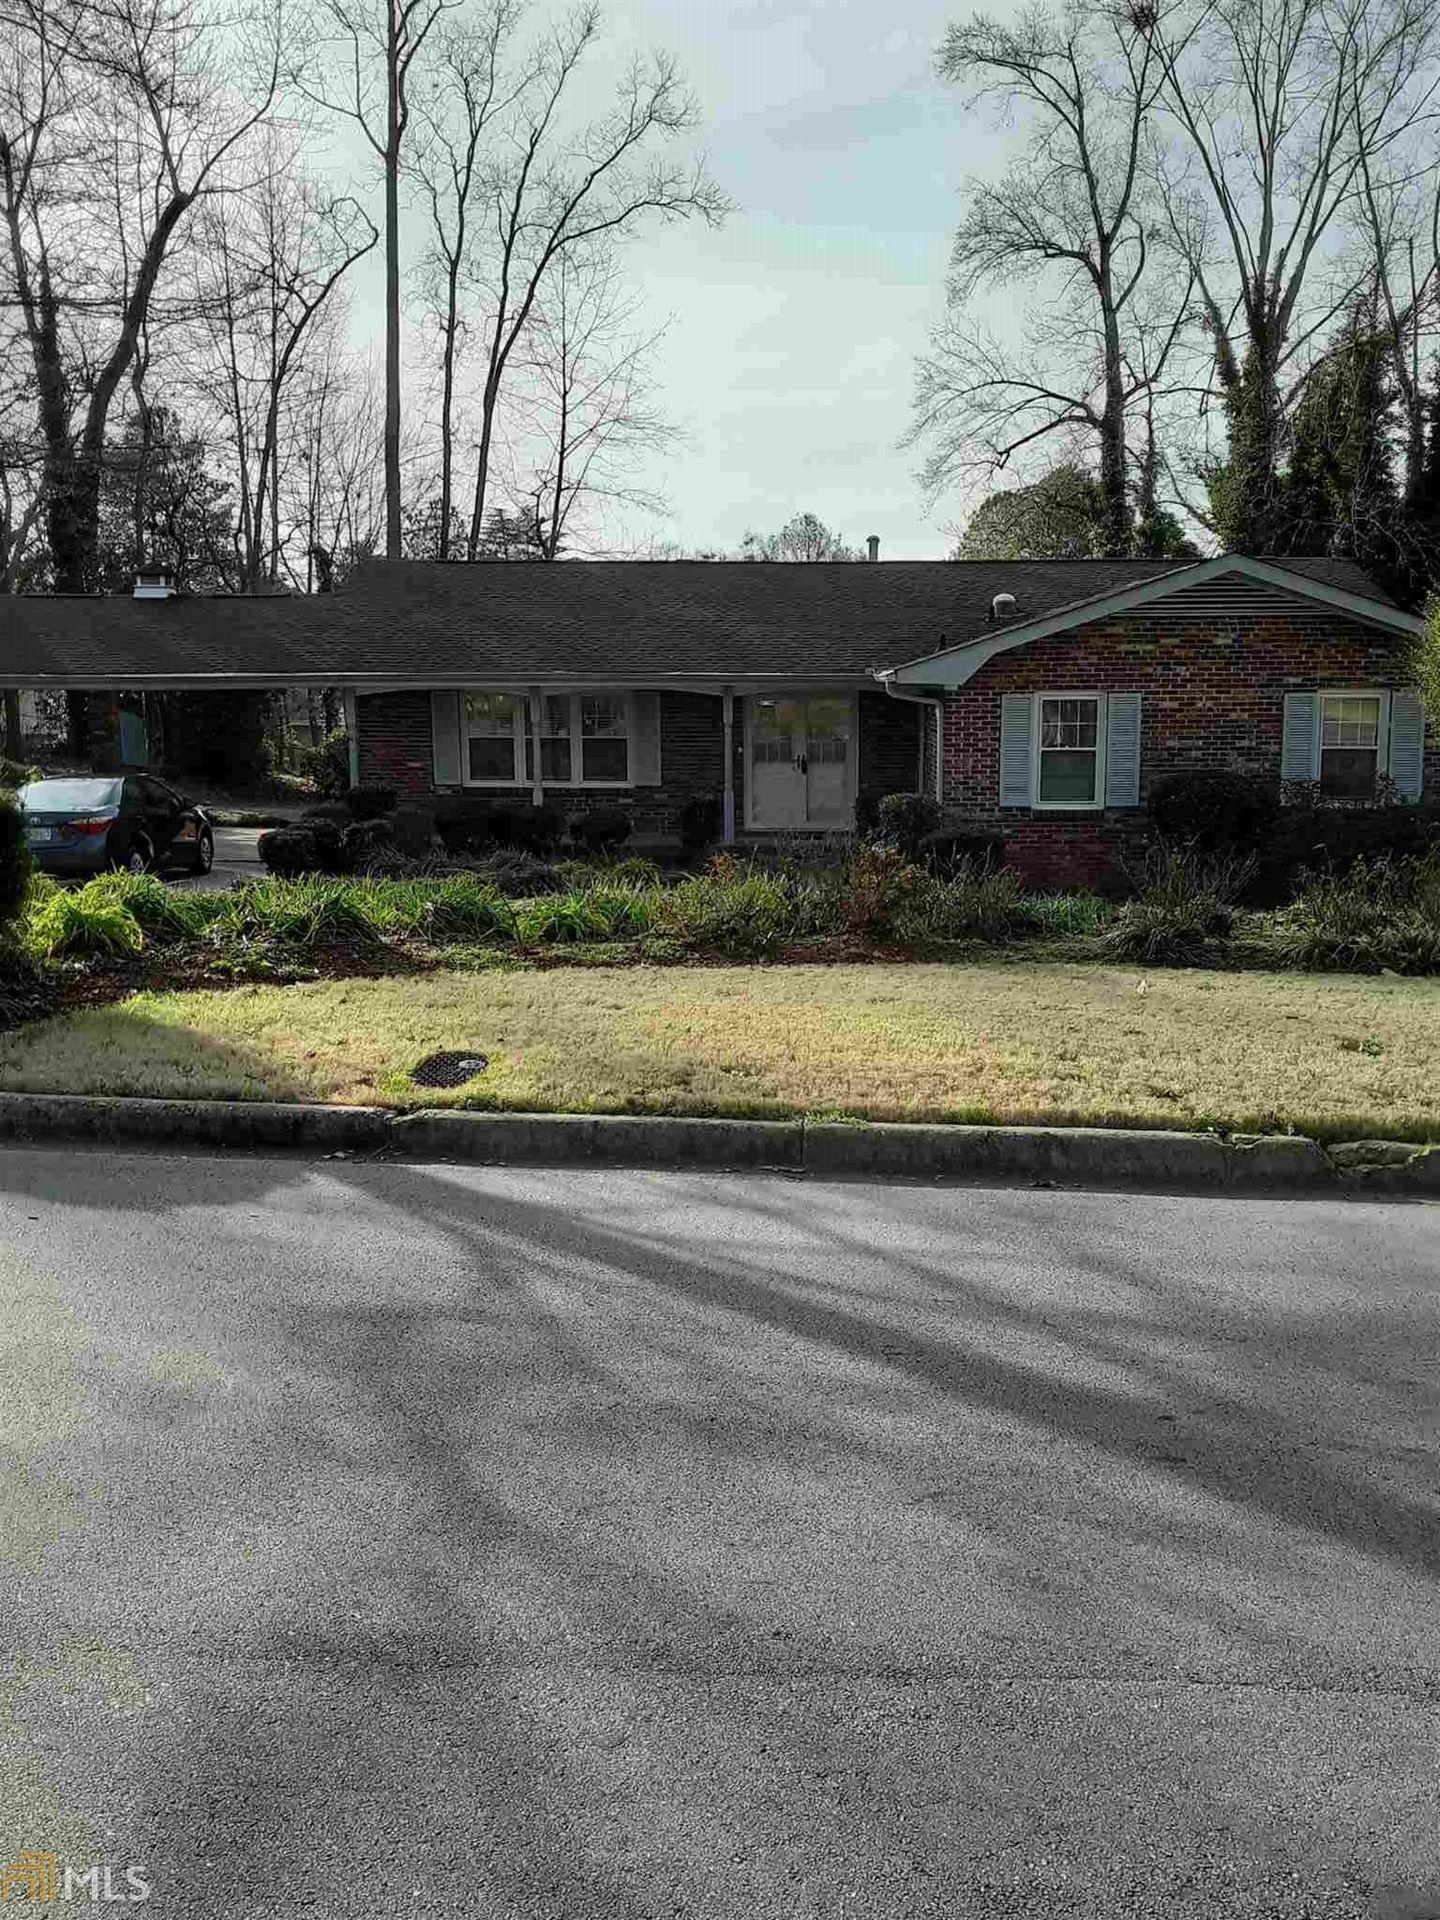 2249 Sterling Ridge Rd, Decatur, GA 30032 - MLS#: 8907209